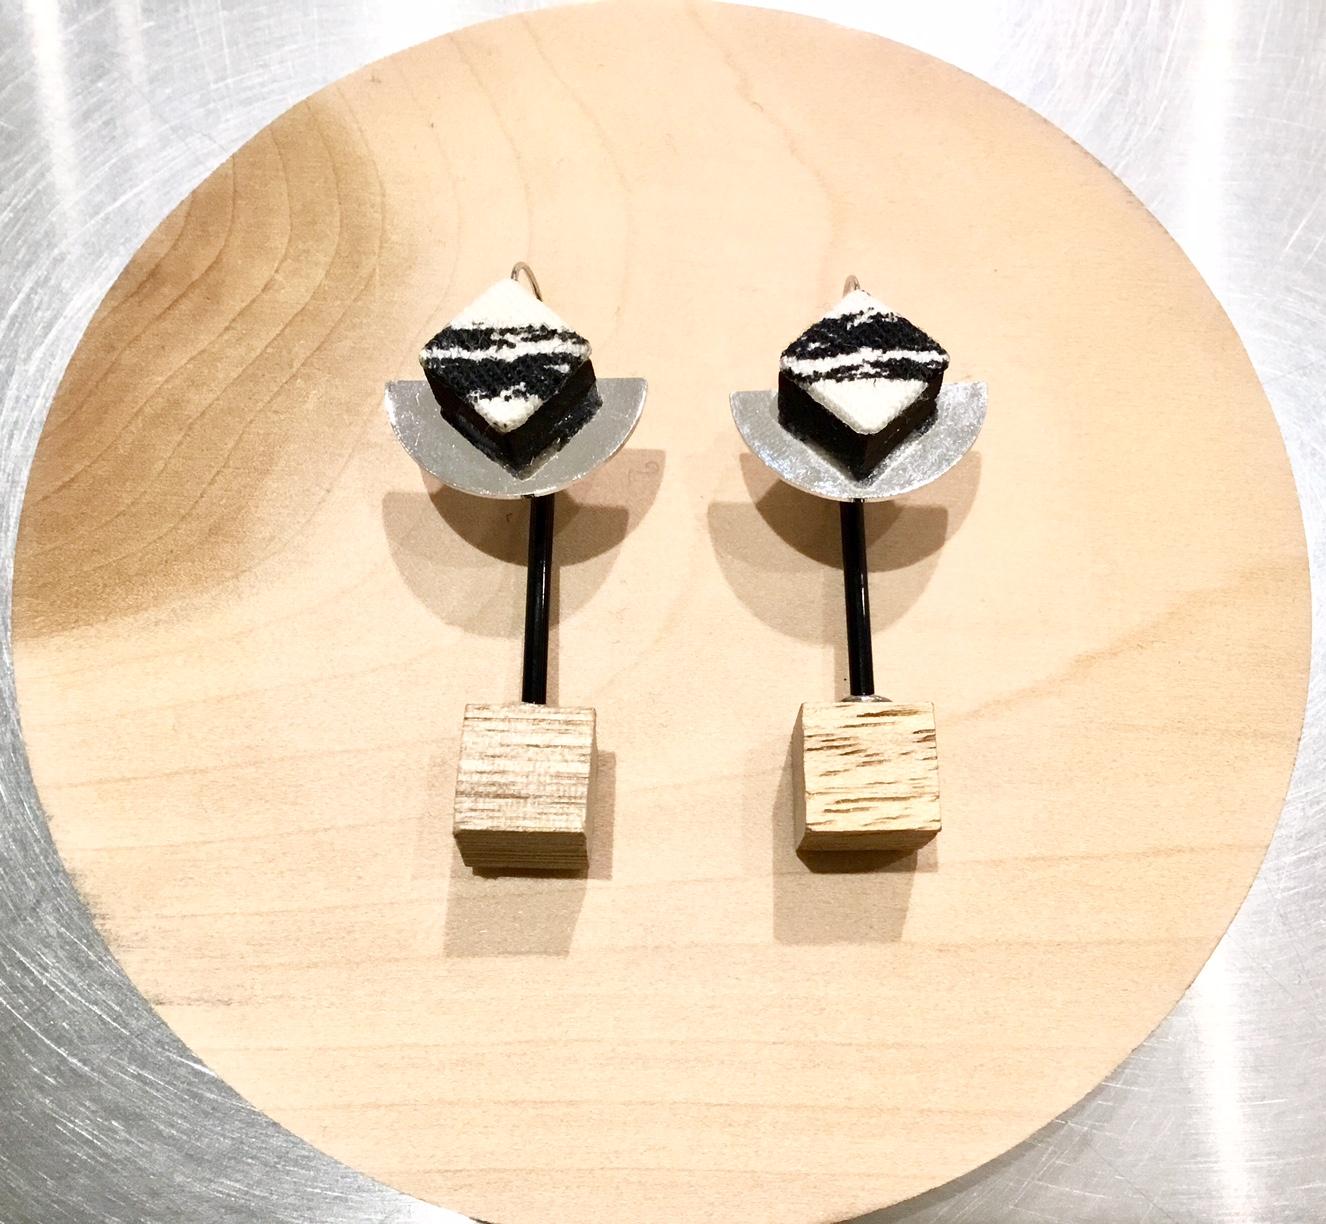 KINARIYA【キナリヤ】Monotone Series thin spot◆eighty88eight 綾川・新居浜